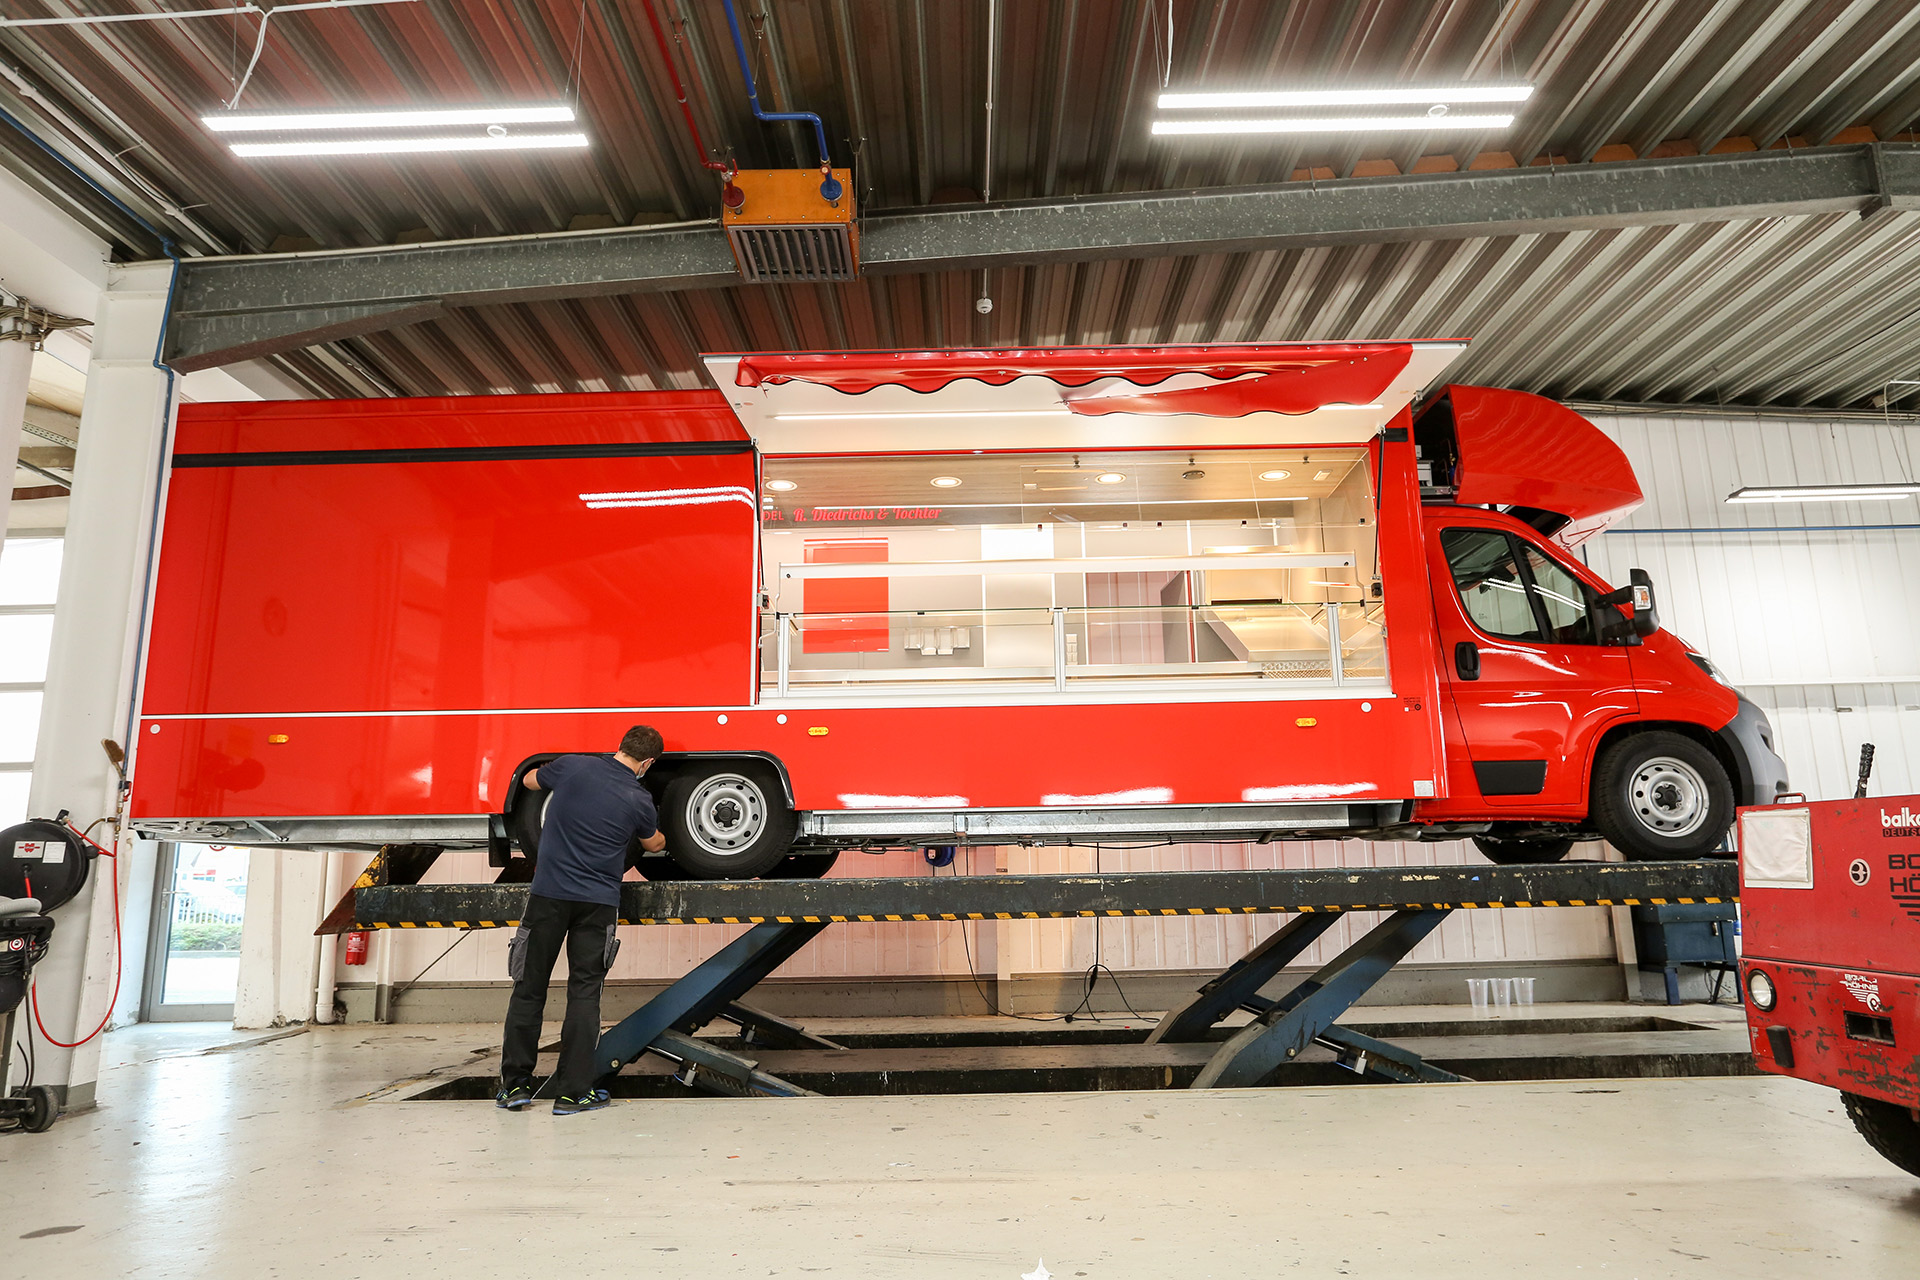 Borco Höhns Verkaufsfahrzeug in der Endabnahme